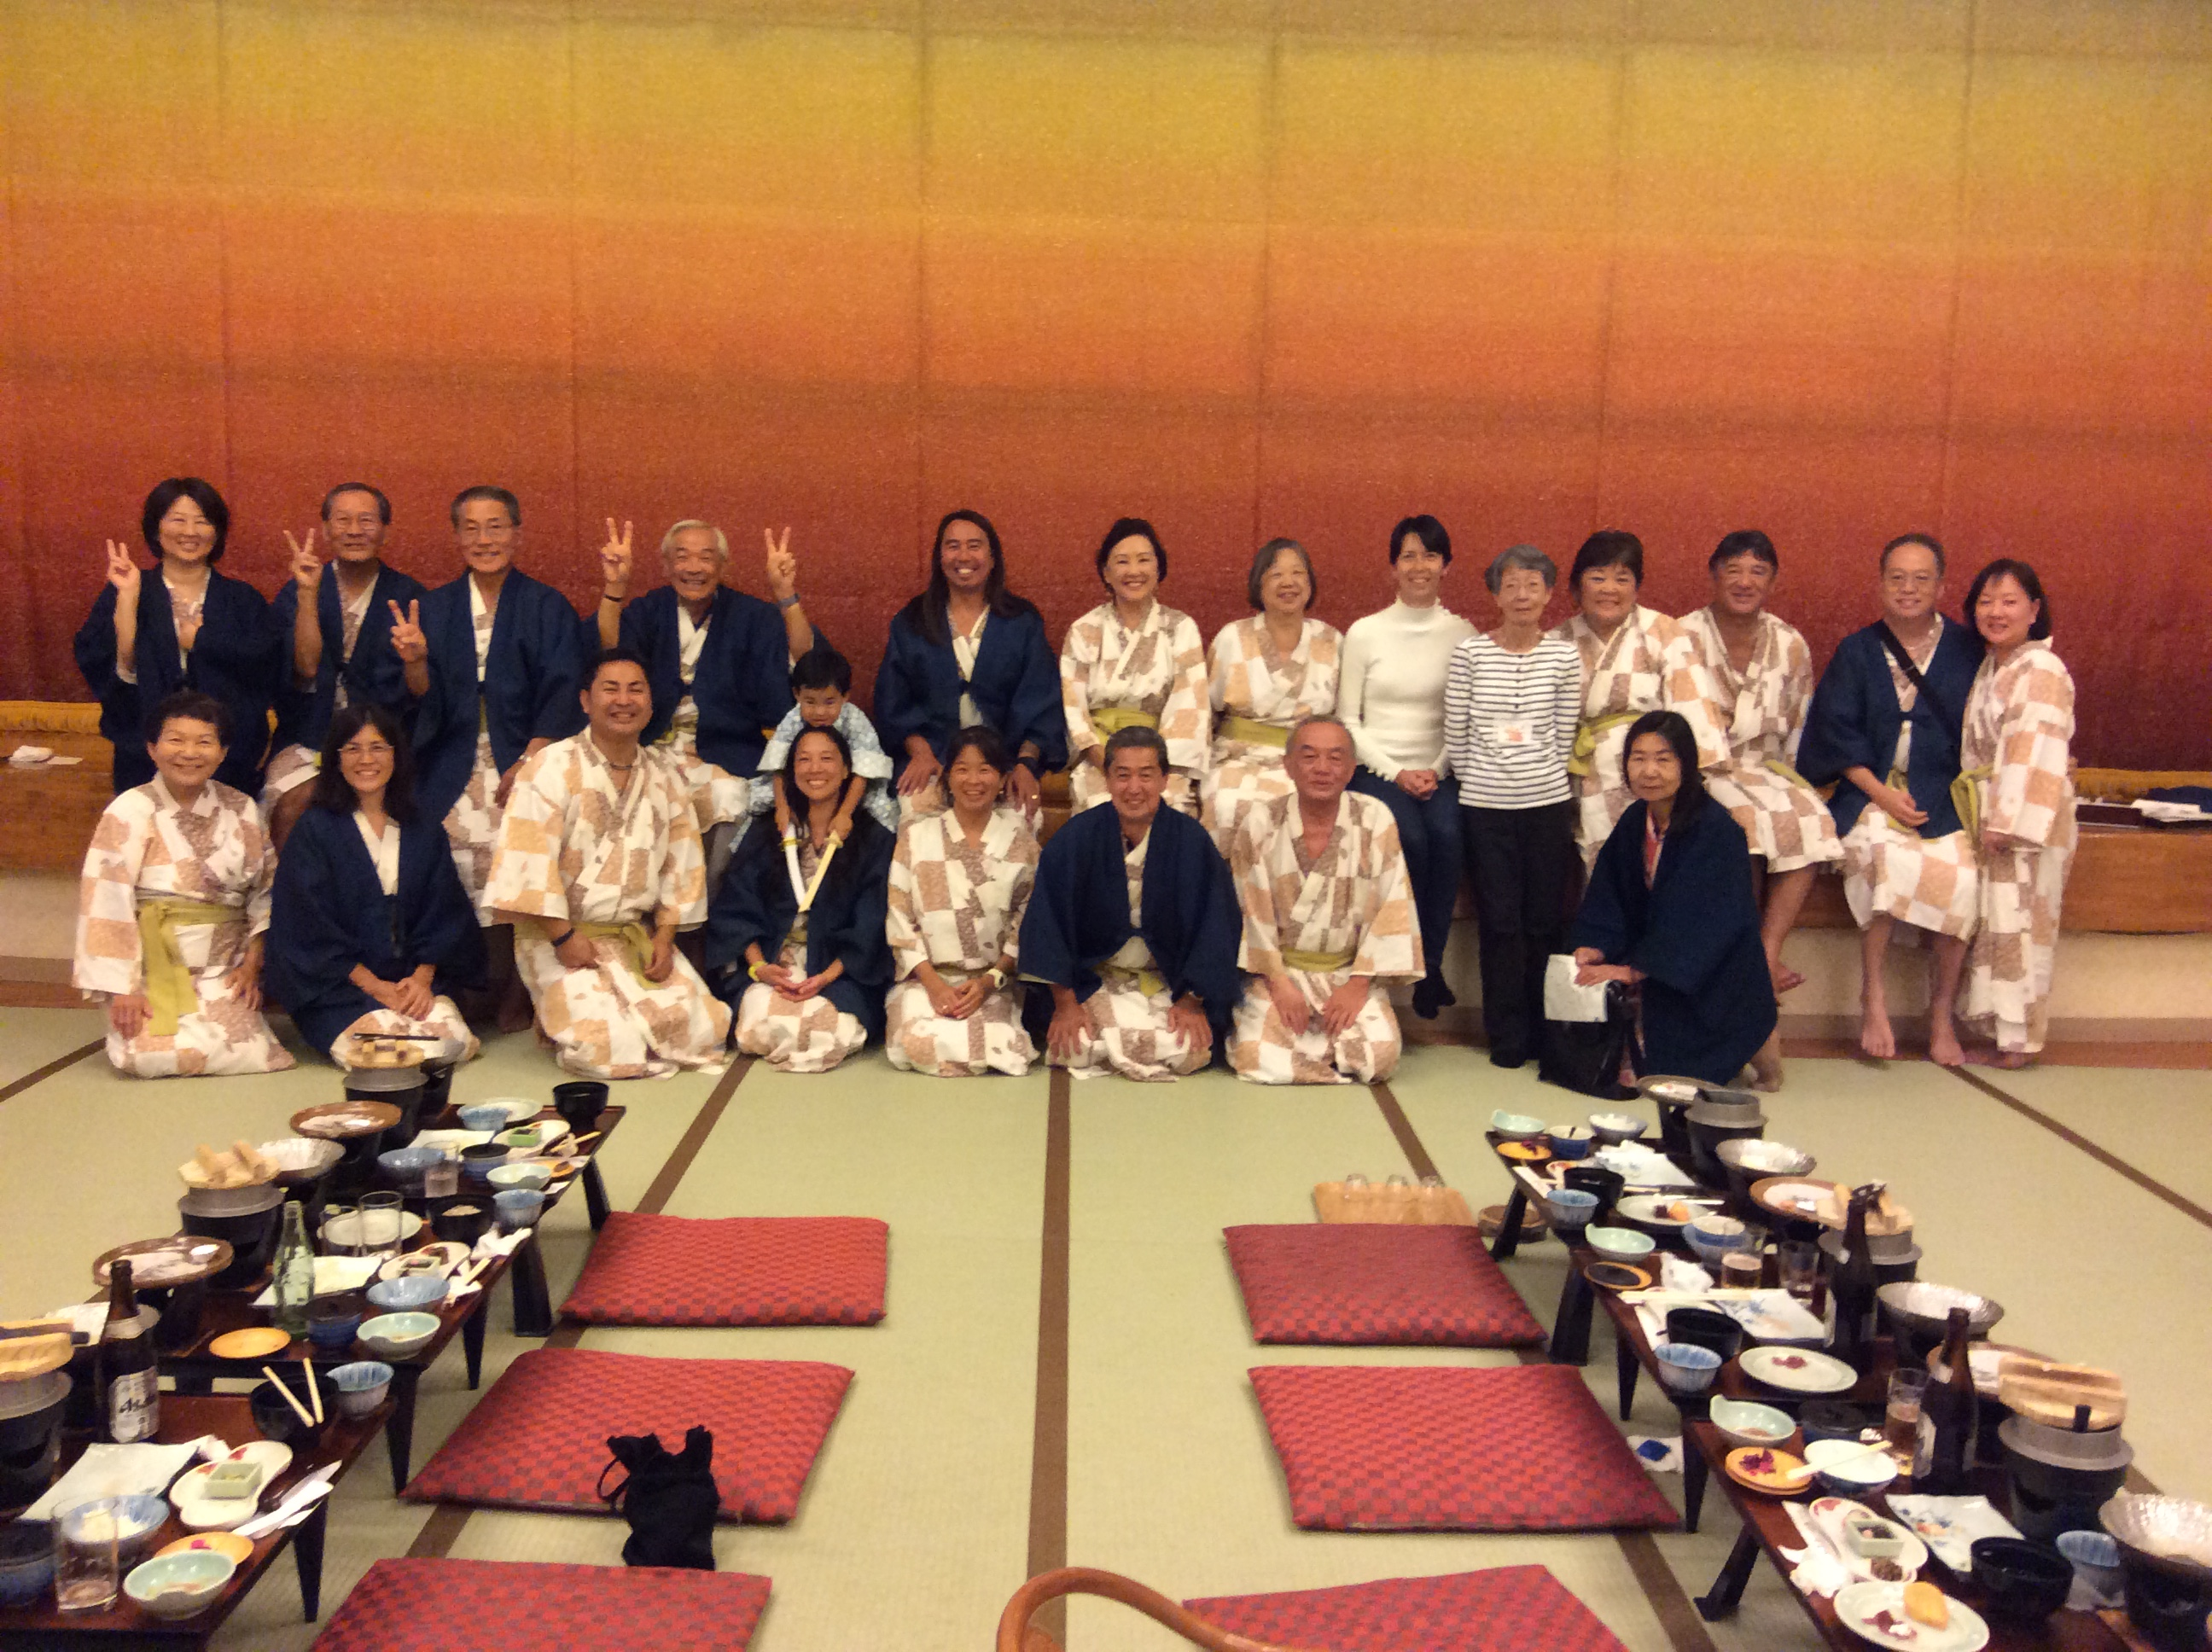 Kanazawa, Takayama & Tokyo Autumn Tour